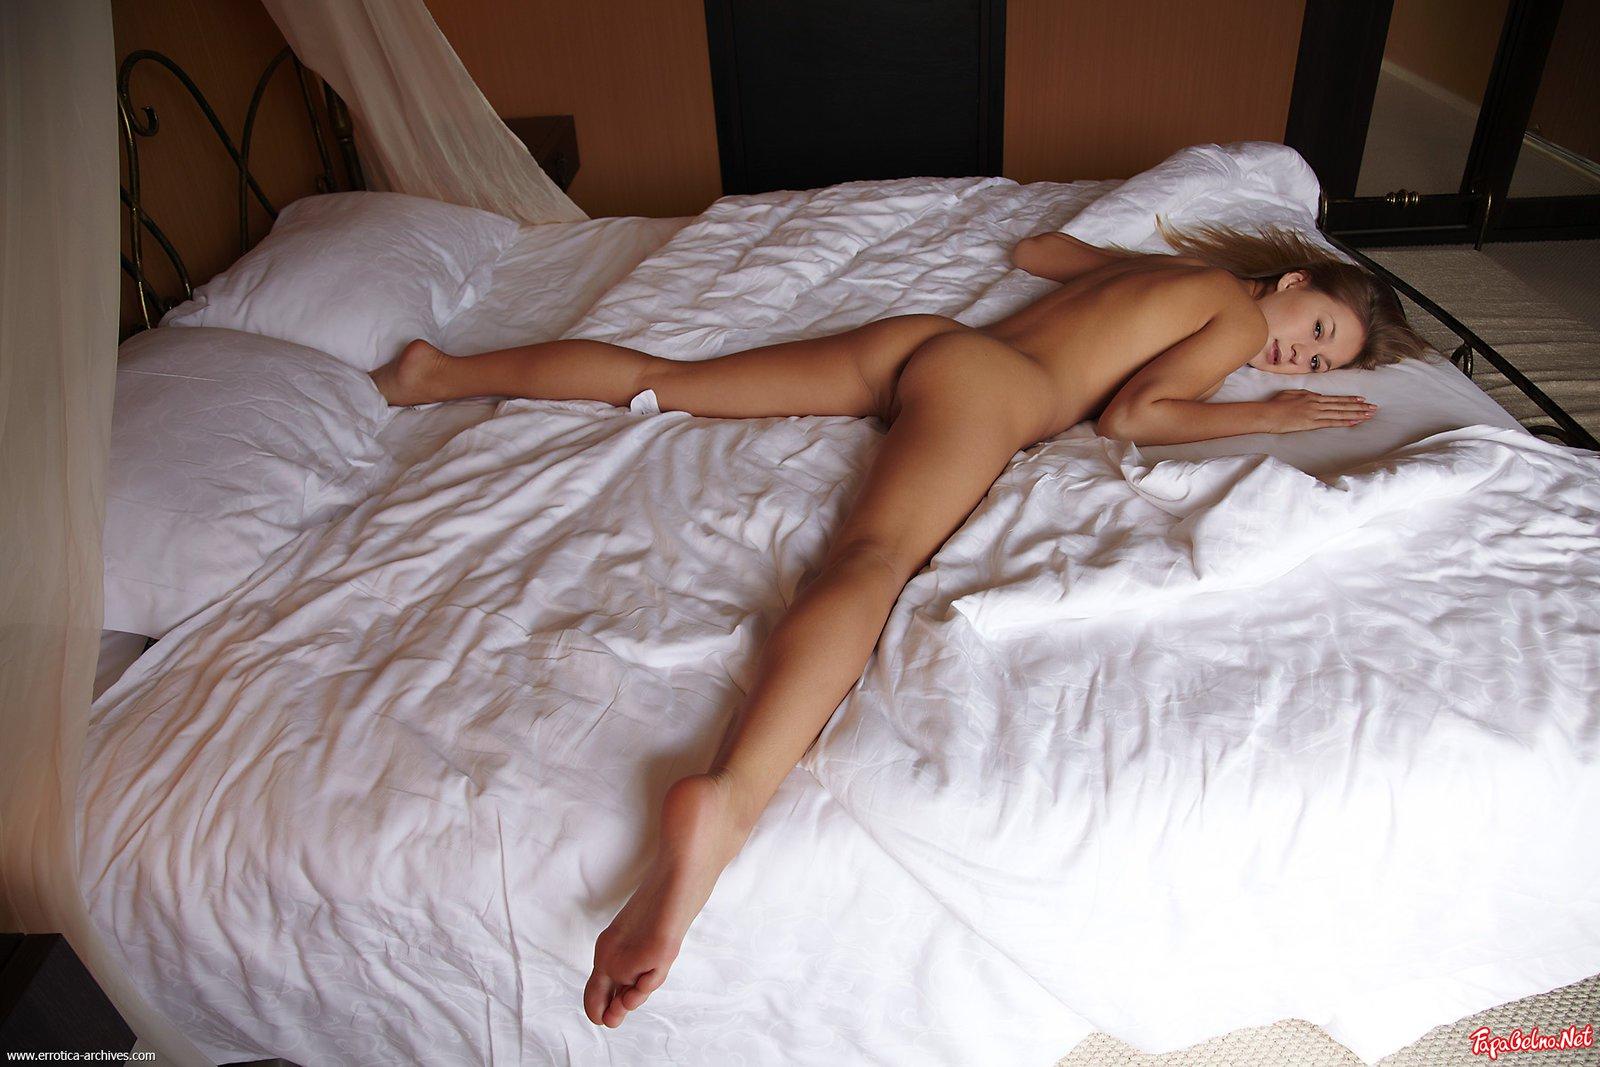 Фото Голых Молодых На Кровати